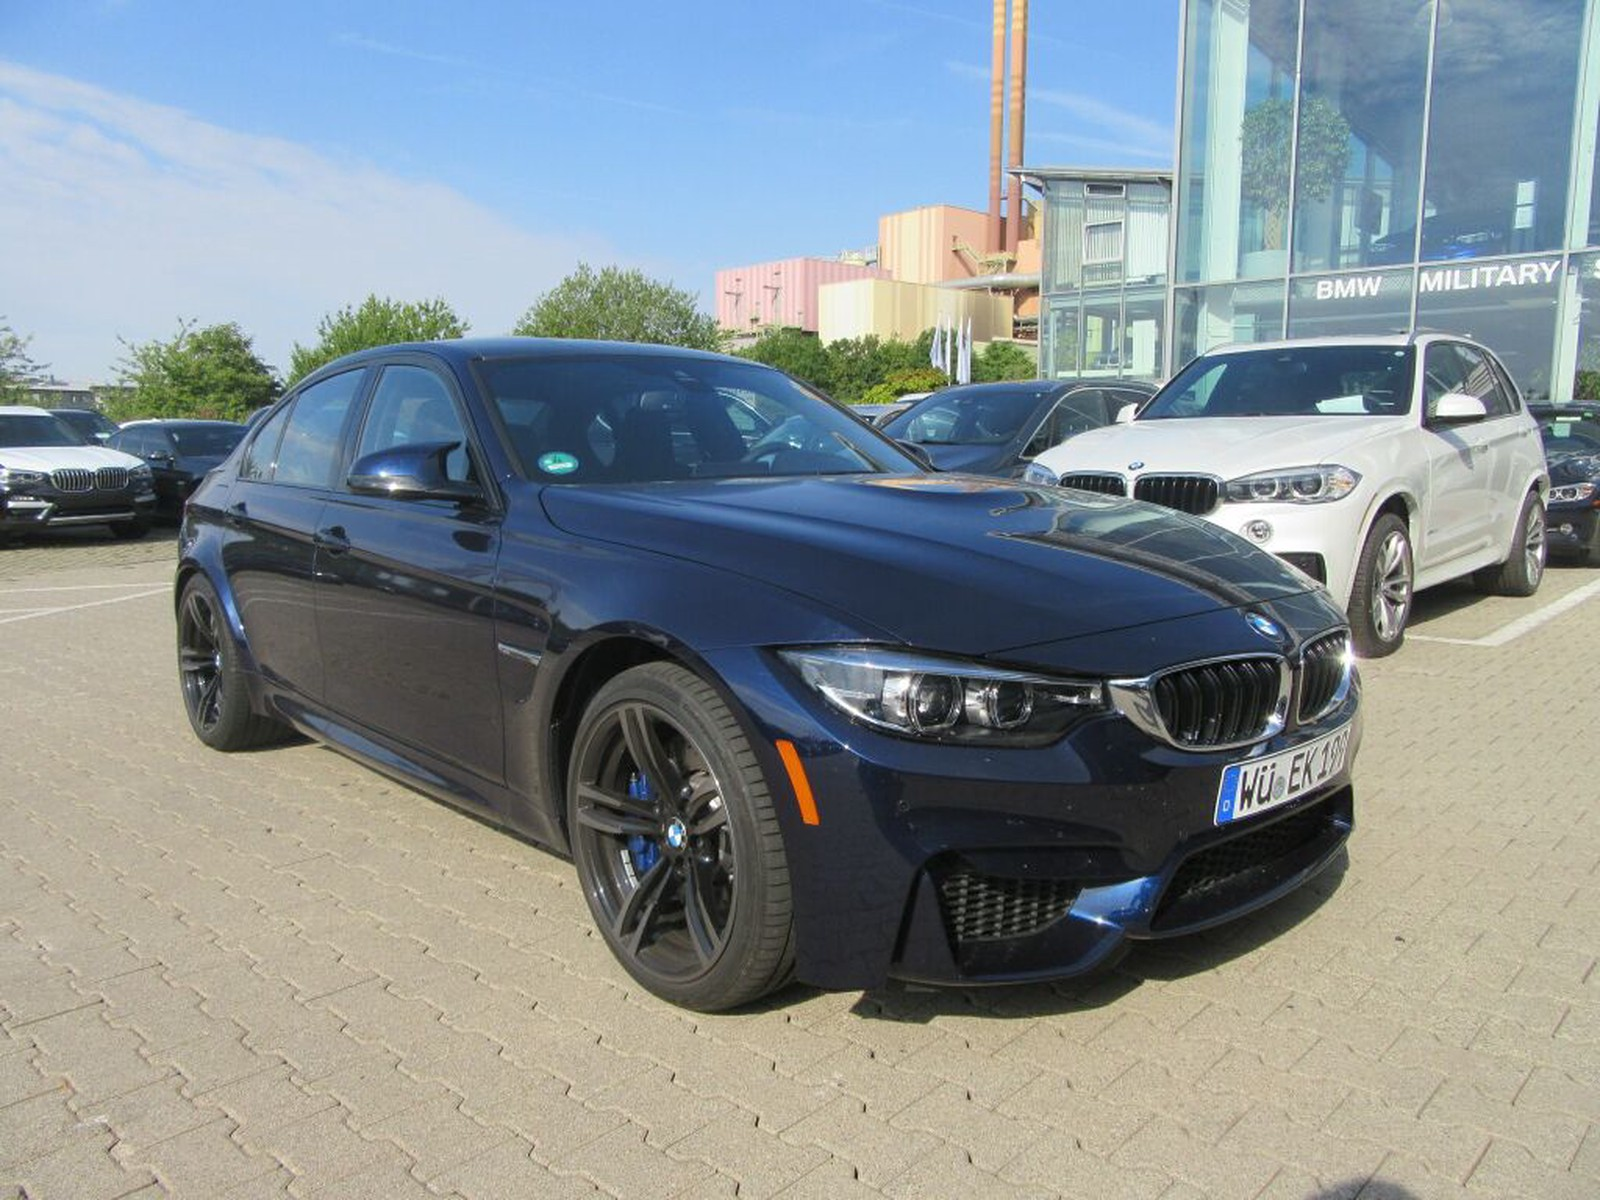 Bmw M3 Sedan Tax Free Military Sales In Grafenwöhr Price 64995 Usd Int Nr U 14315 Sold